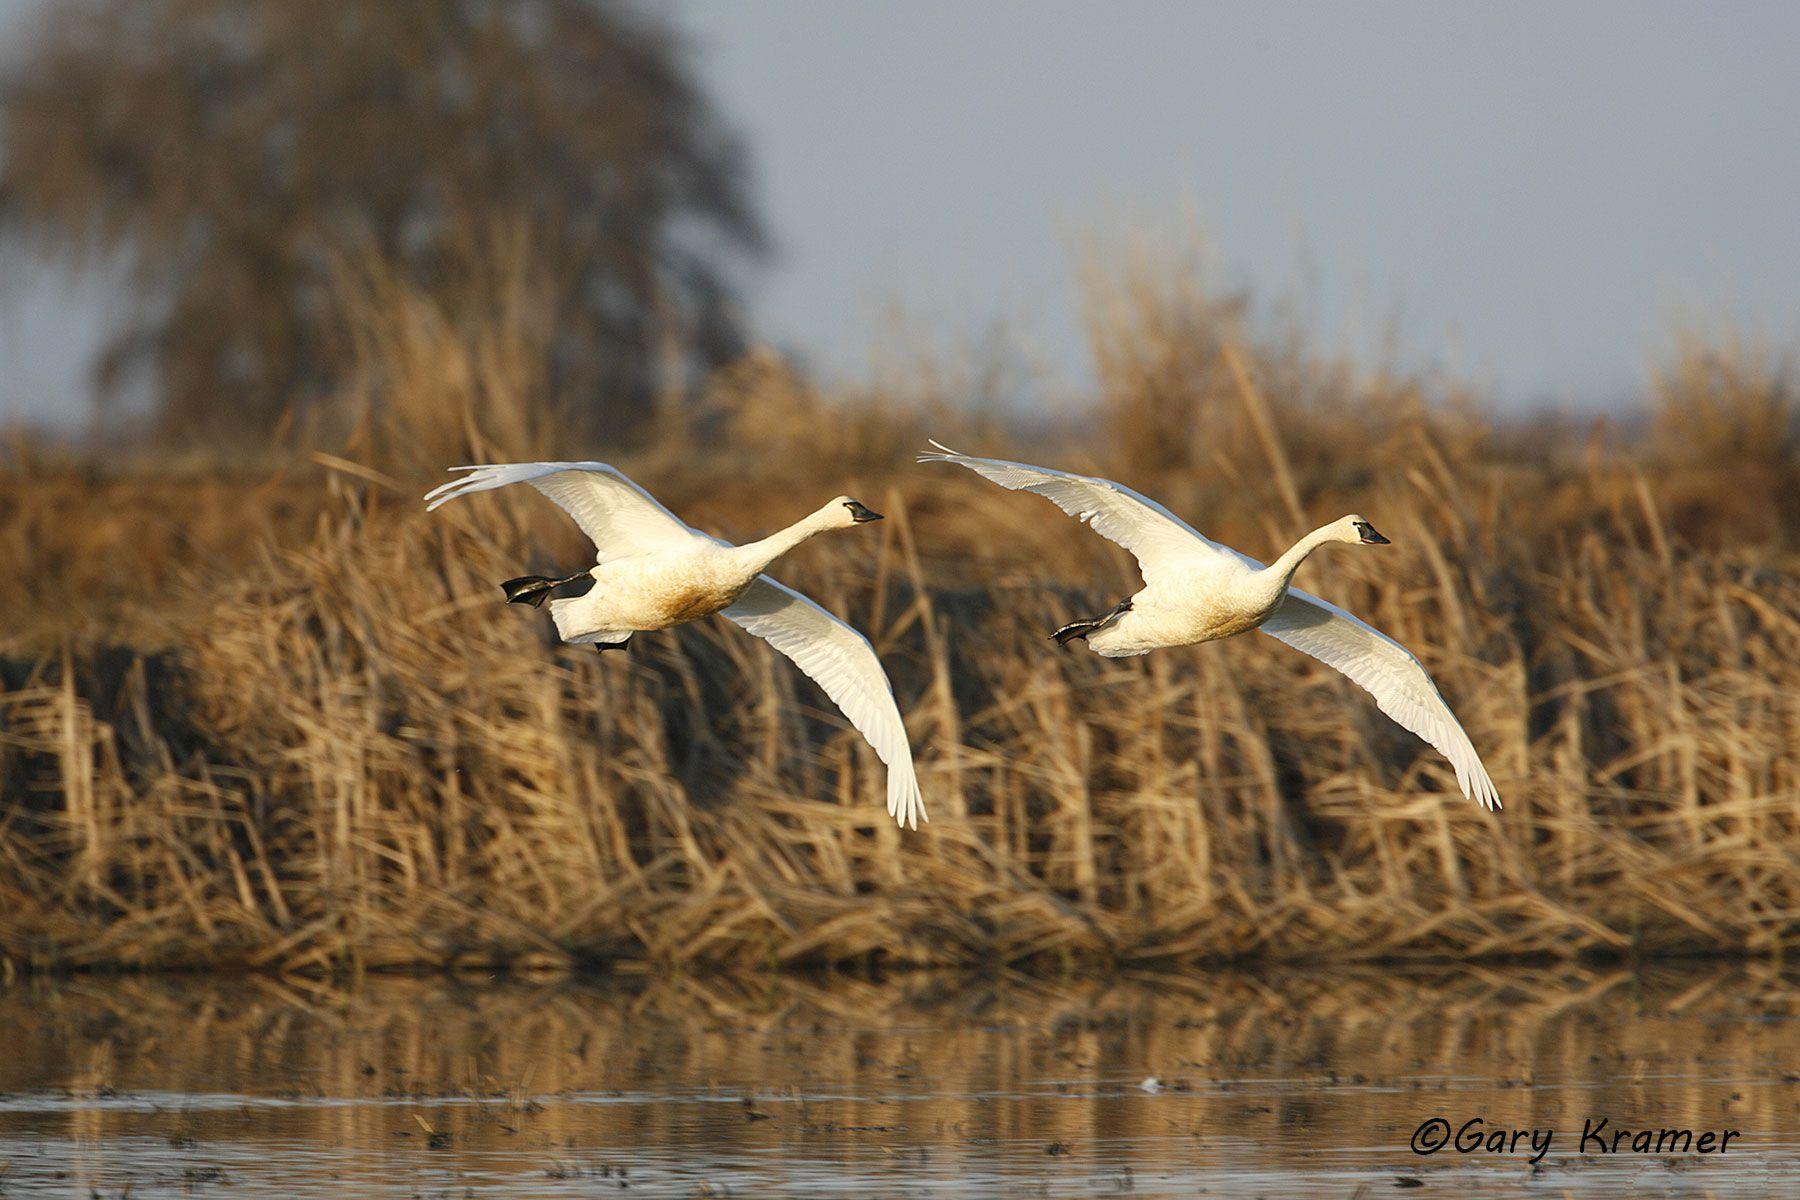 Tundra (Whistling) Swan (Cygnus columbianus) - NBWT#188d